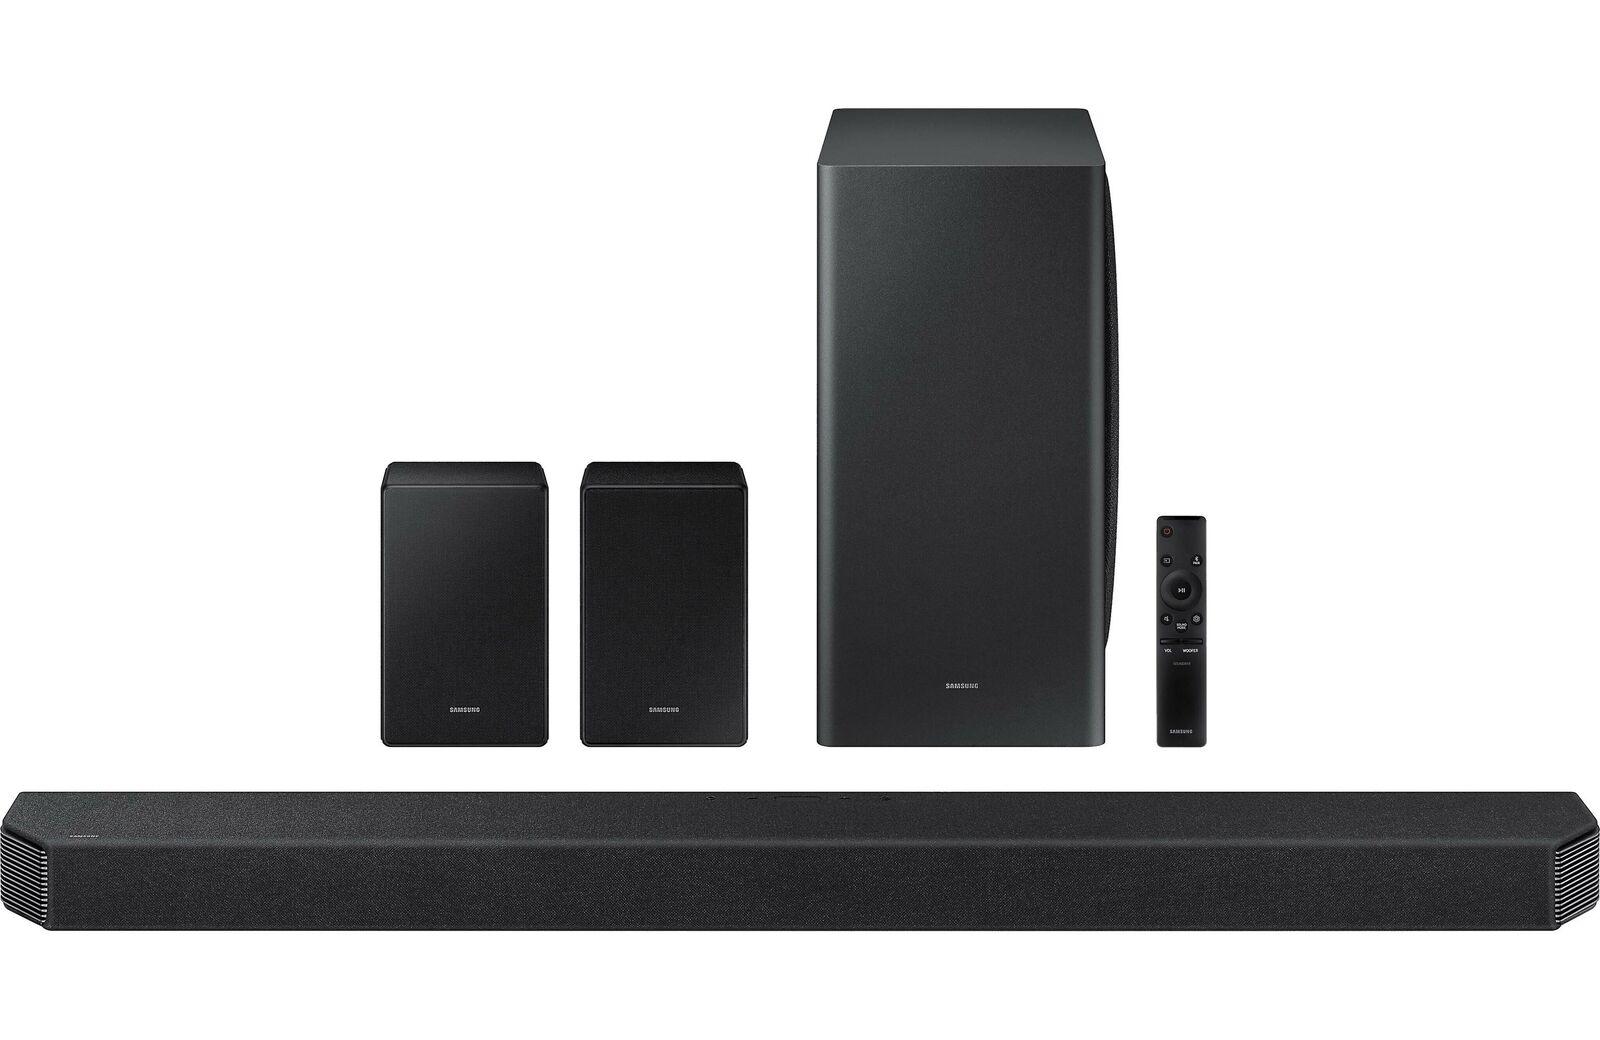 SAMSUNG HW-Q950A 11.1.4ch Soundbar Dolby Atmos/DTS:X, Alexa(2021), Black $1059 via echo-and-optics at ebay